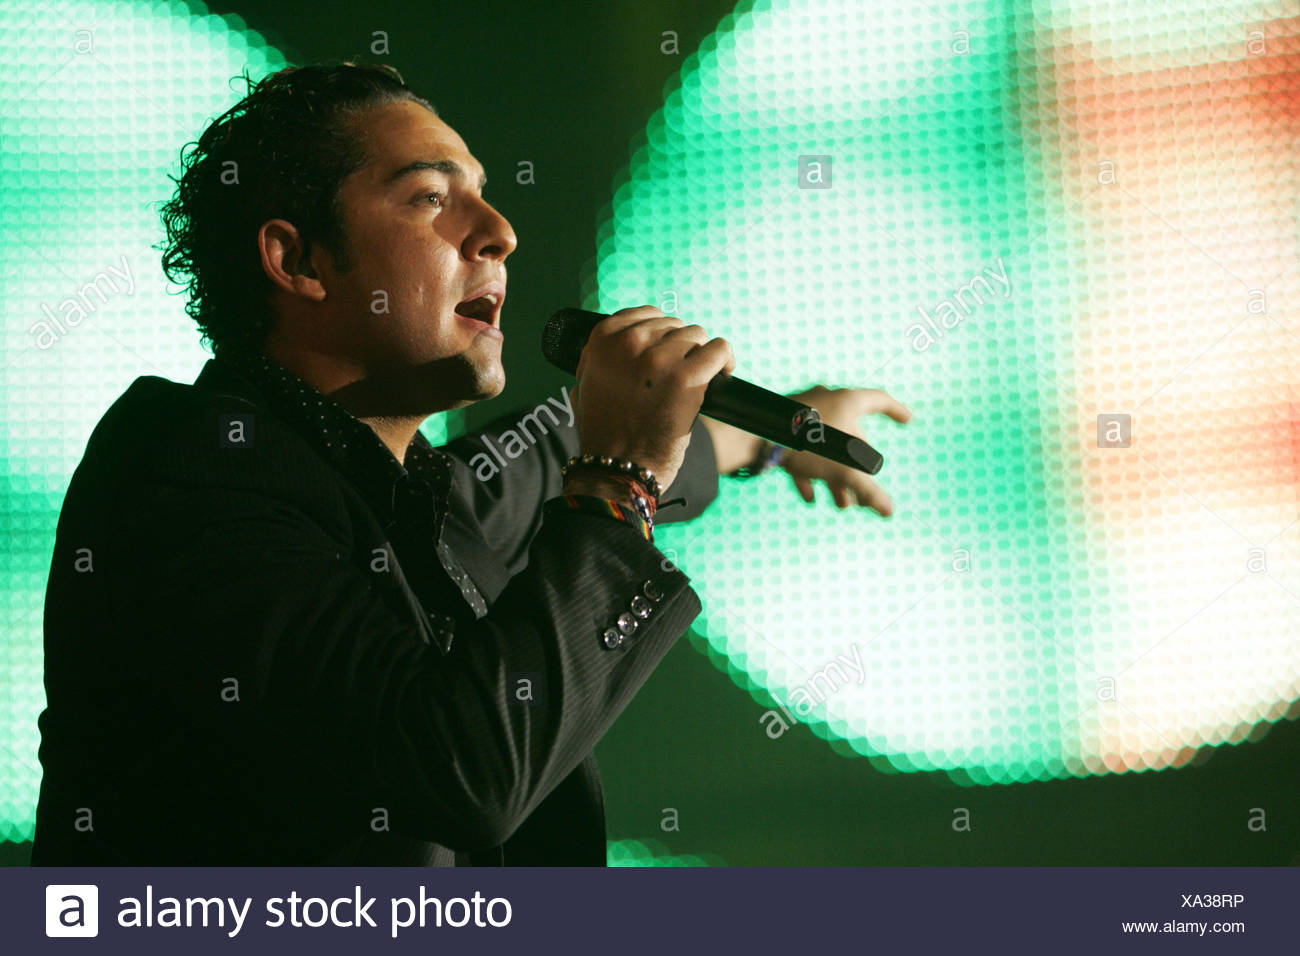 Spanish singer David Bisbal performing live at Energy Stars For Free at Hallenstadion Zurich, Switzerland - Stock Image